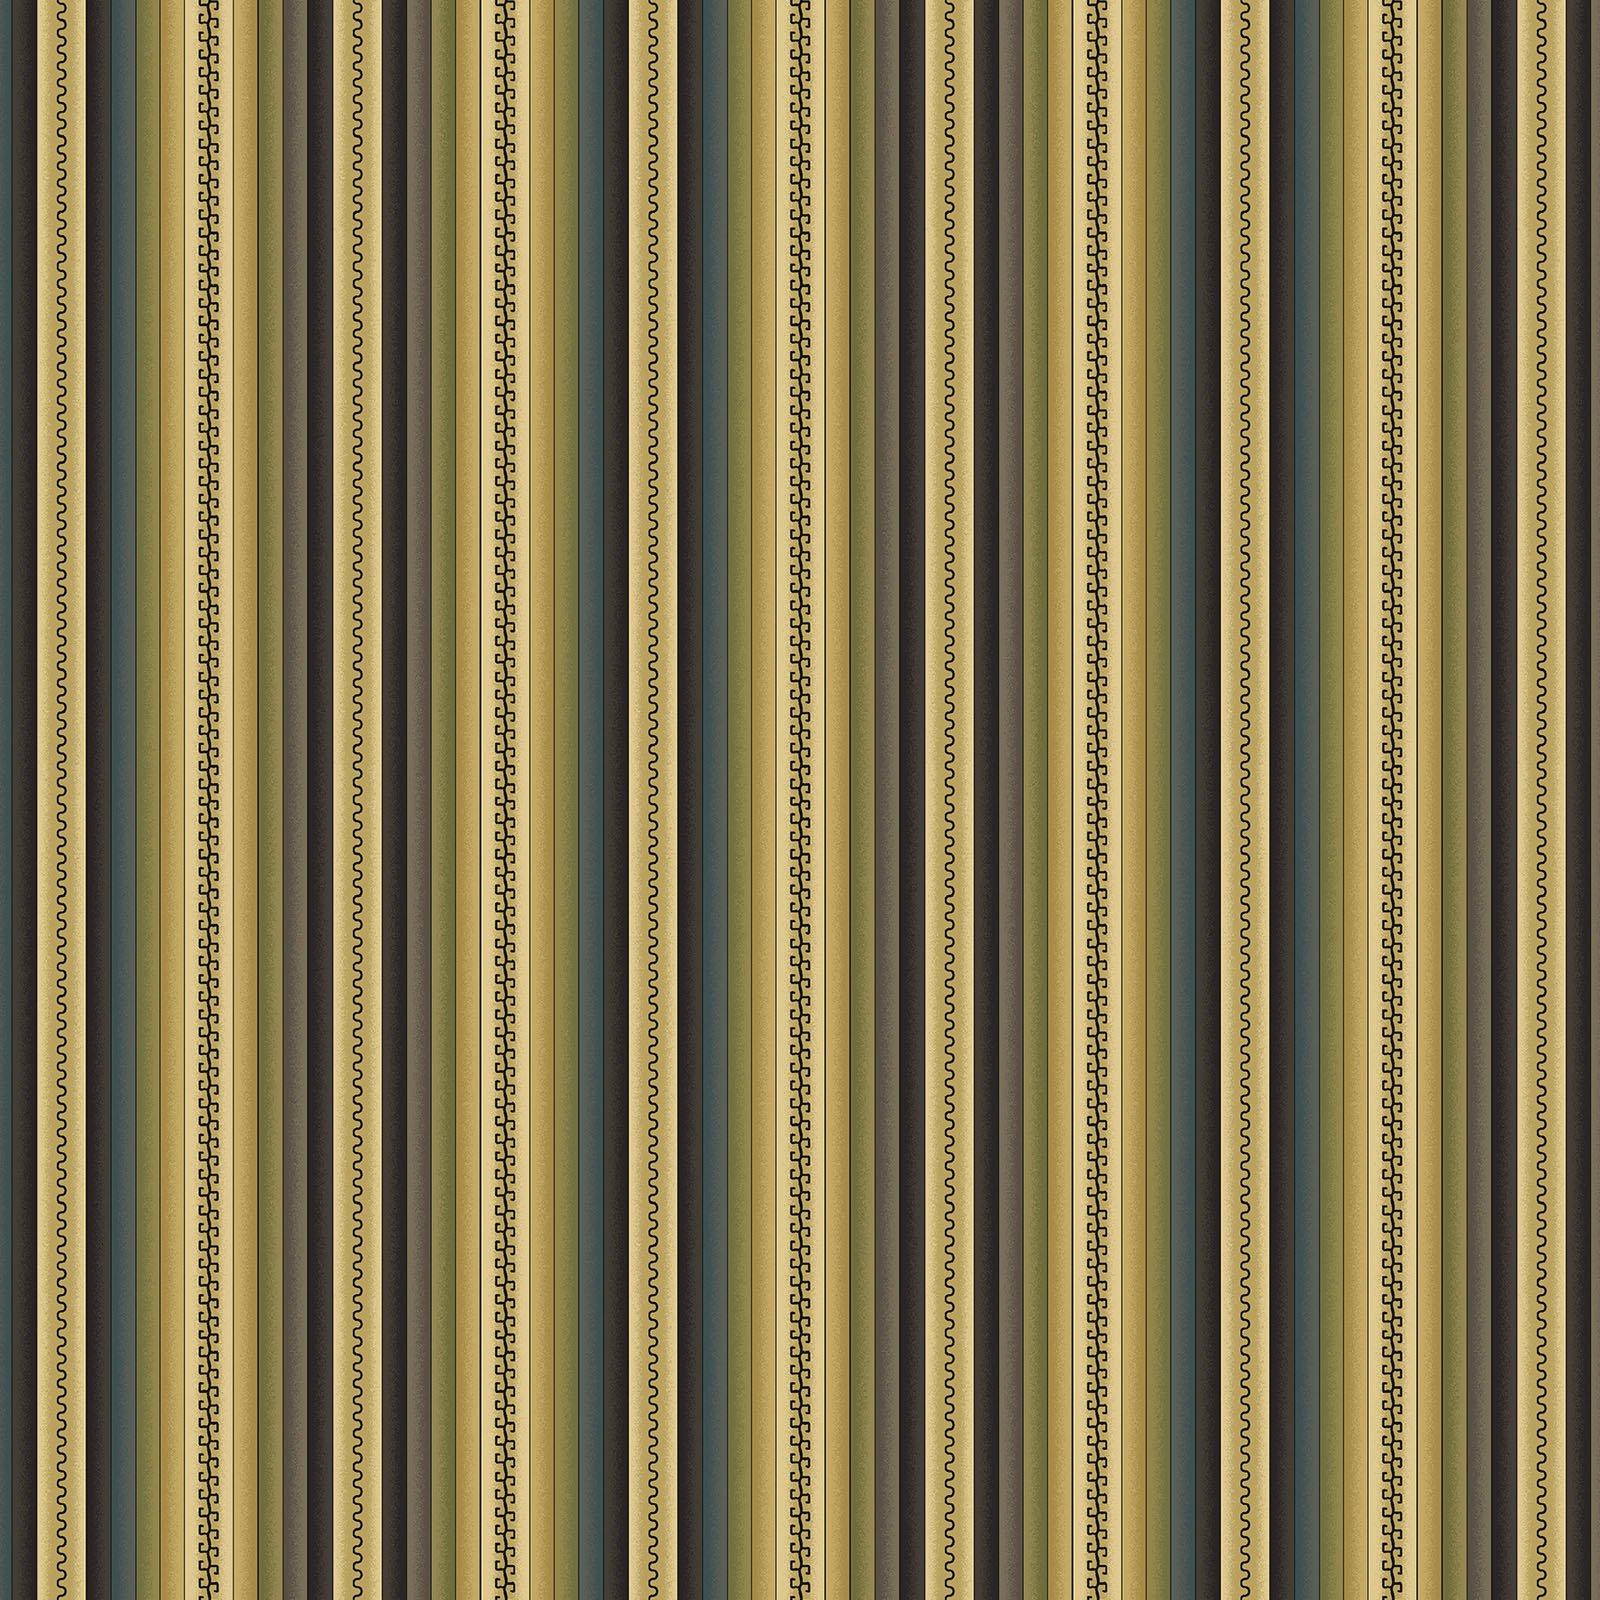 Blanket Stripe Teal/Multi<br/>Benartex 219285